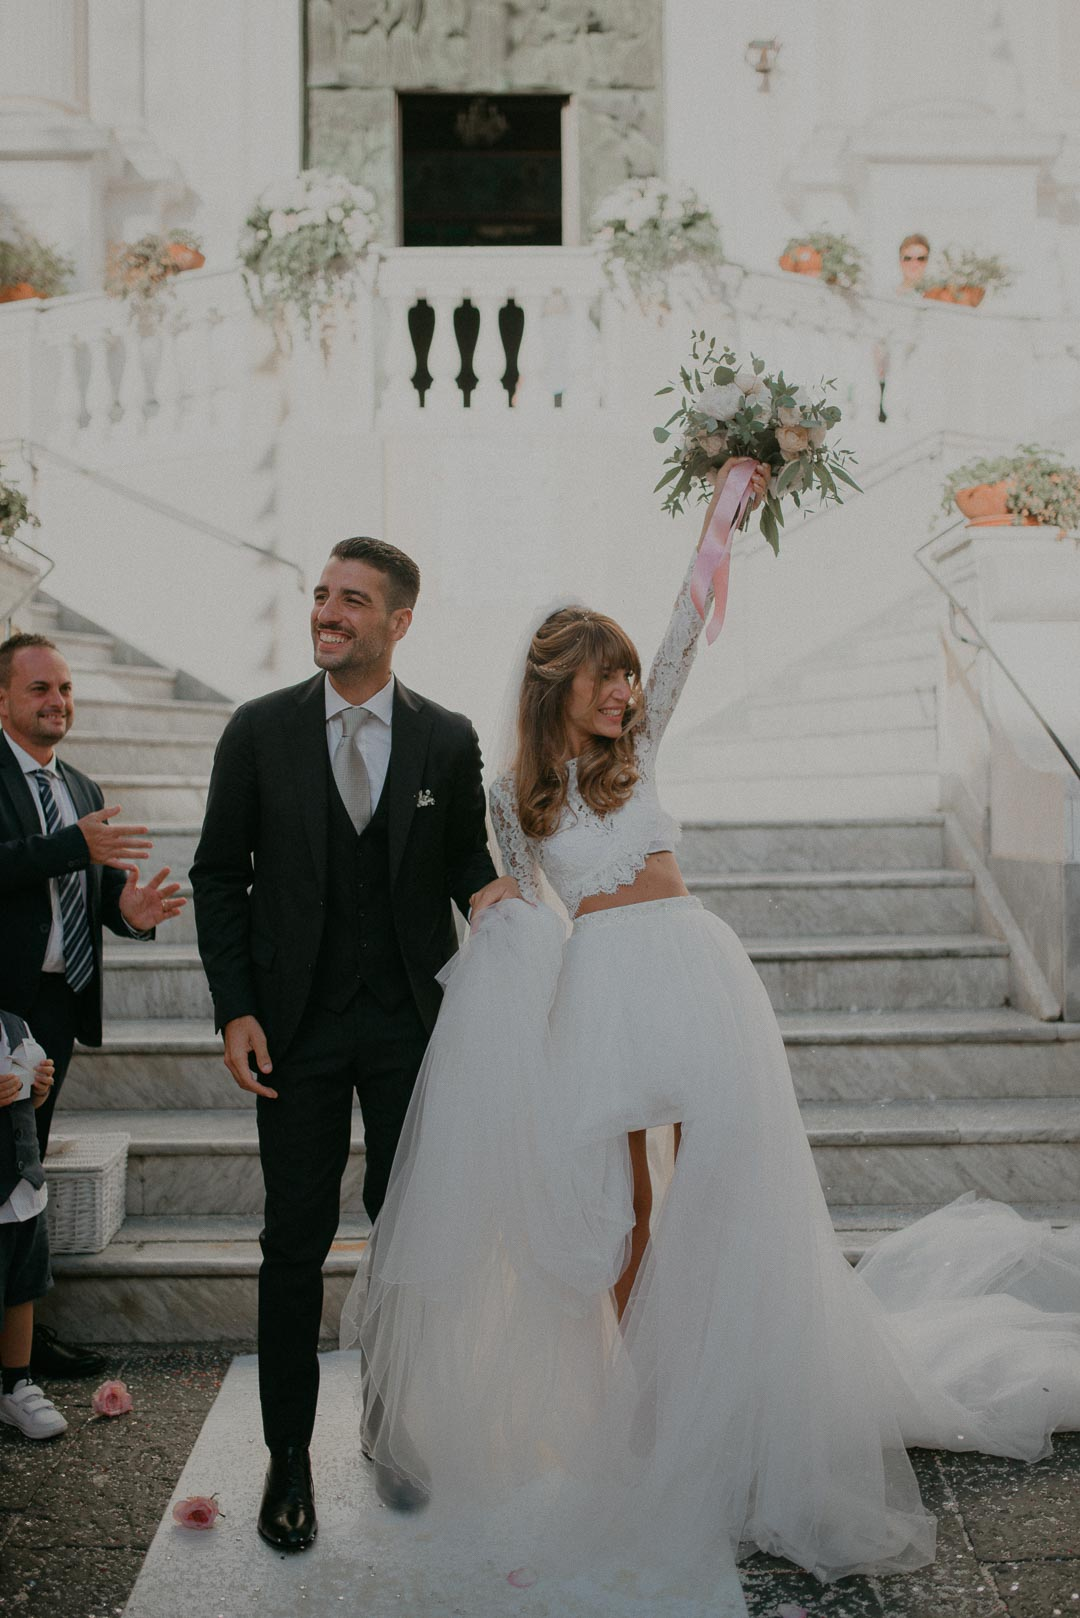 wedding-photographer-destination-fineart-bespoke-reportage-napoli-nabilah-vivianeizzo-spazio46-85